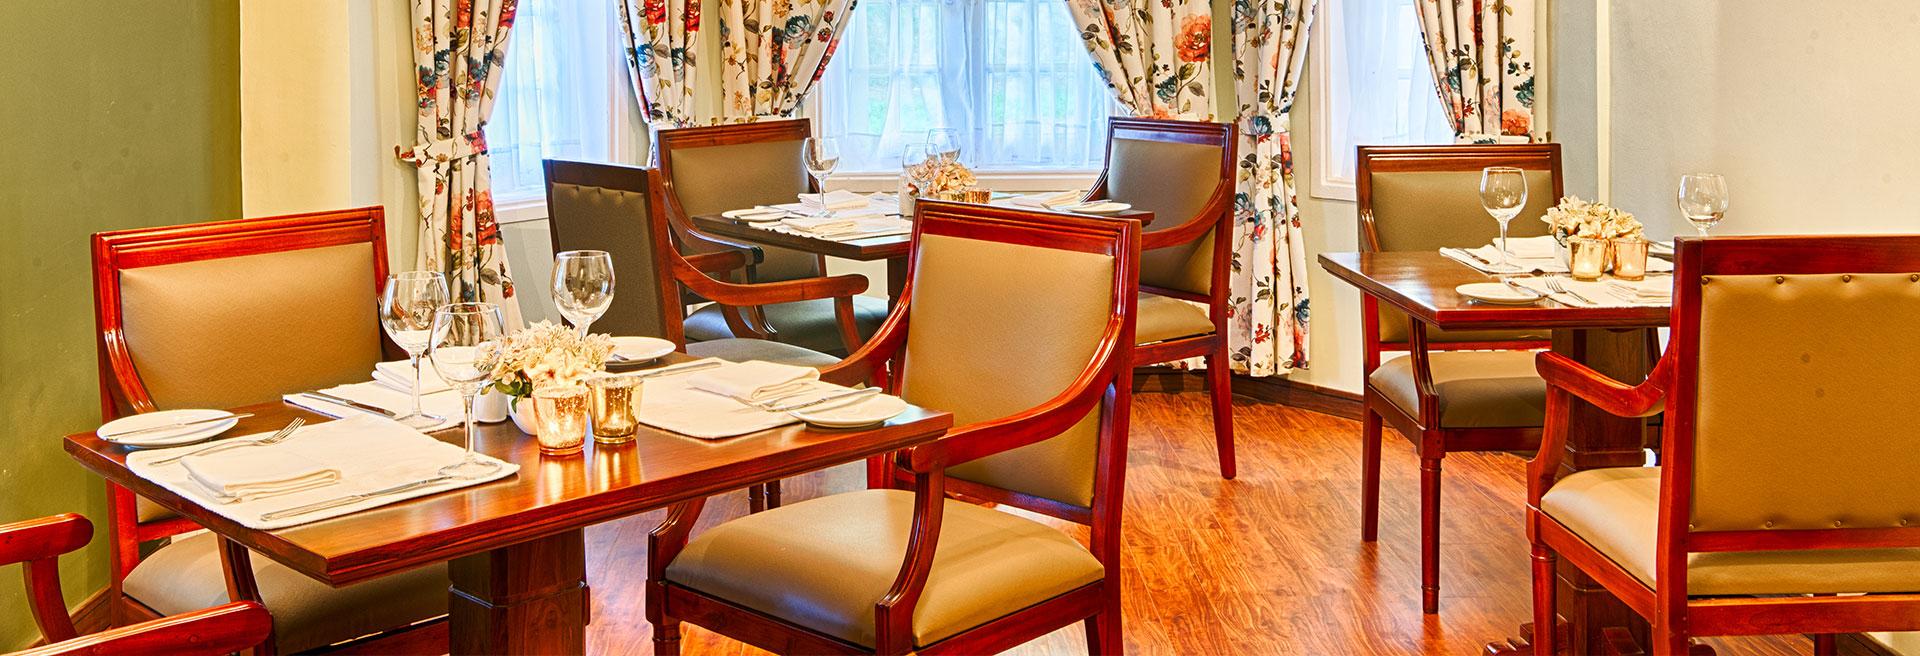 luxury indoor dining